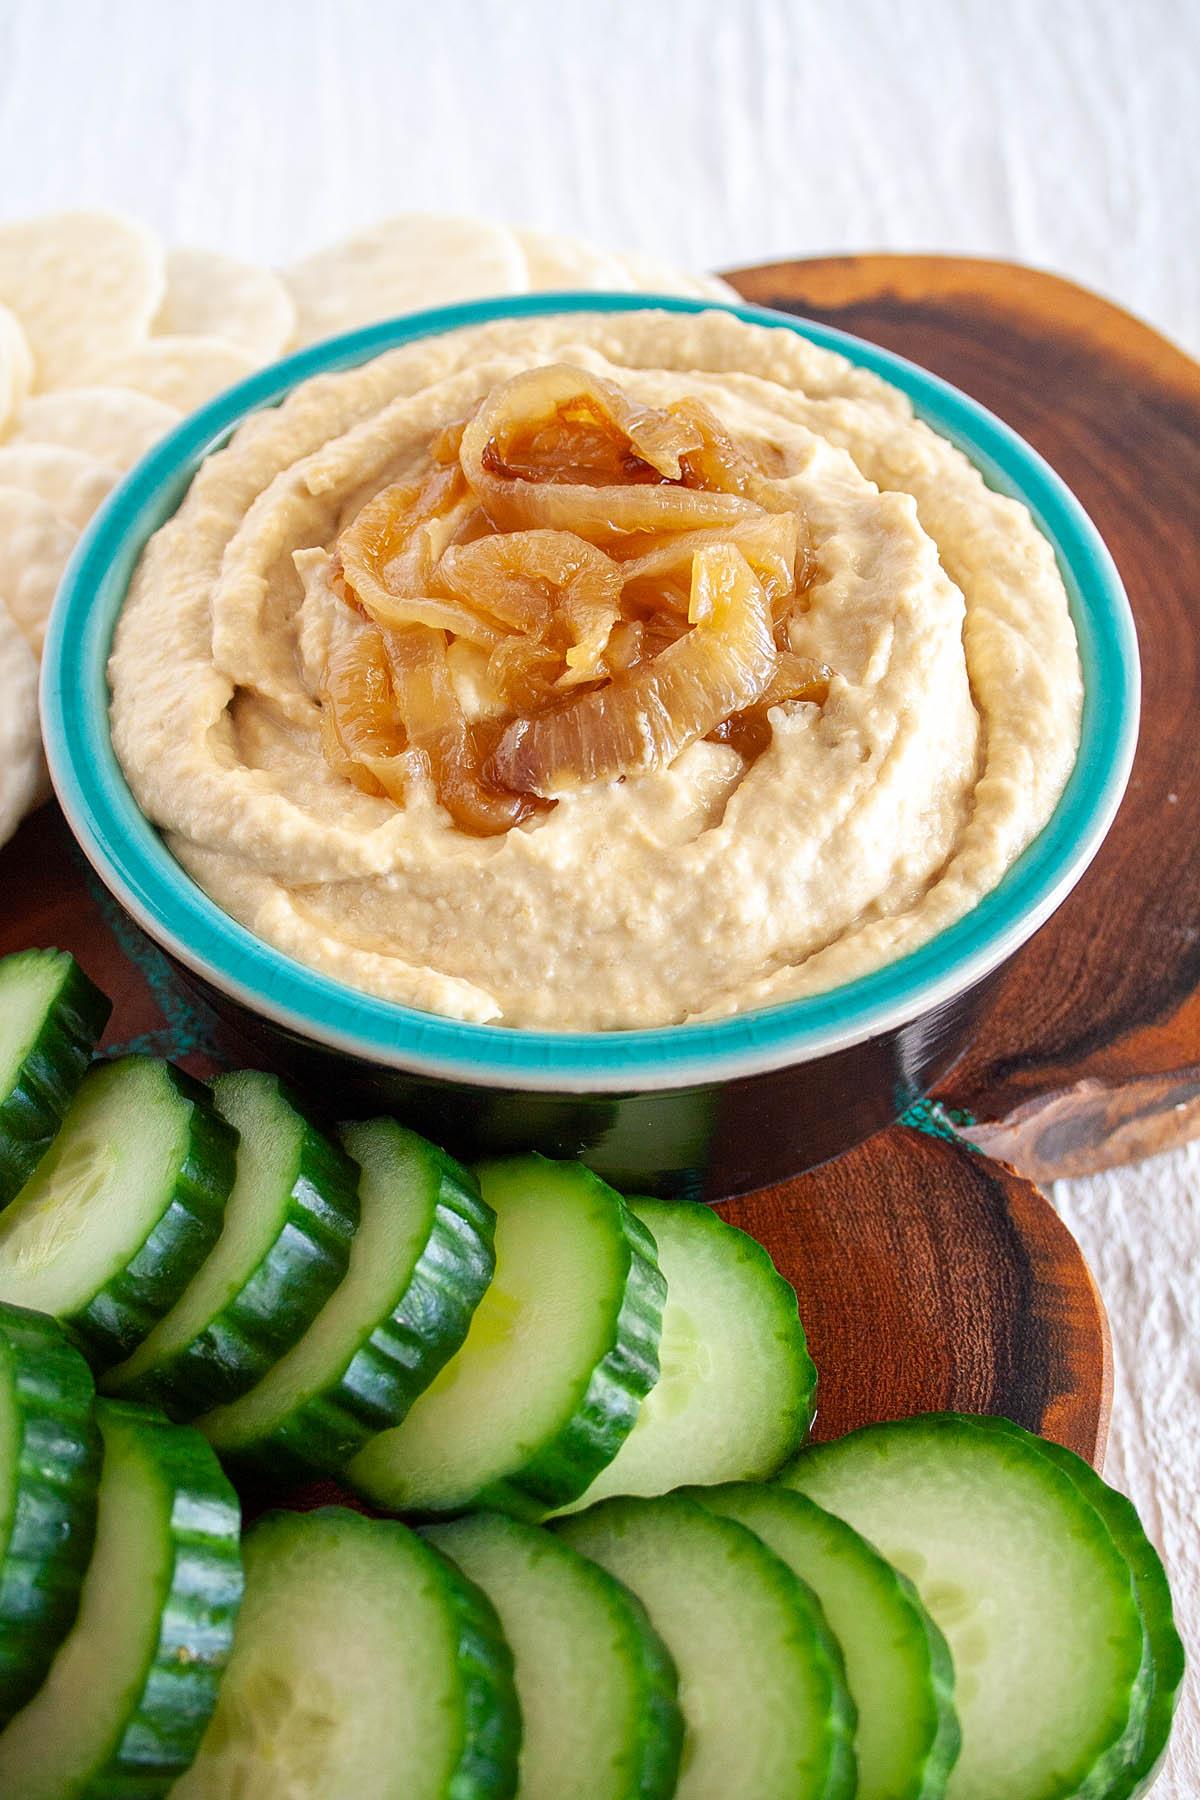 Caramelized Onion Hummus close up.